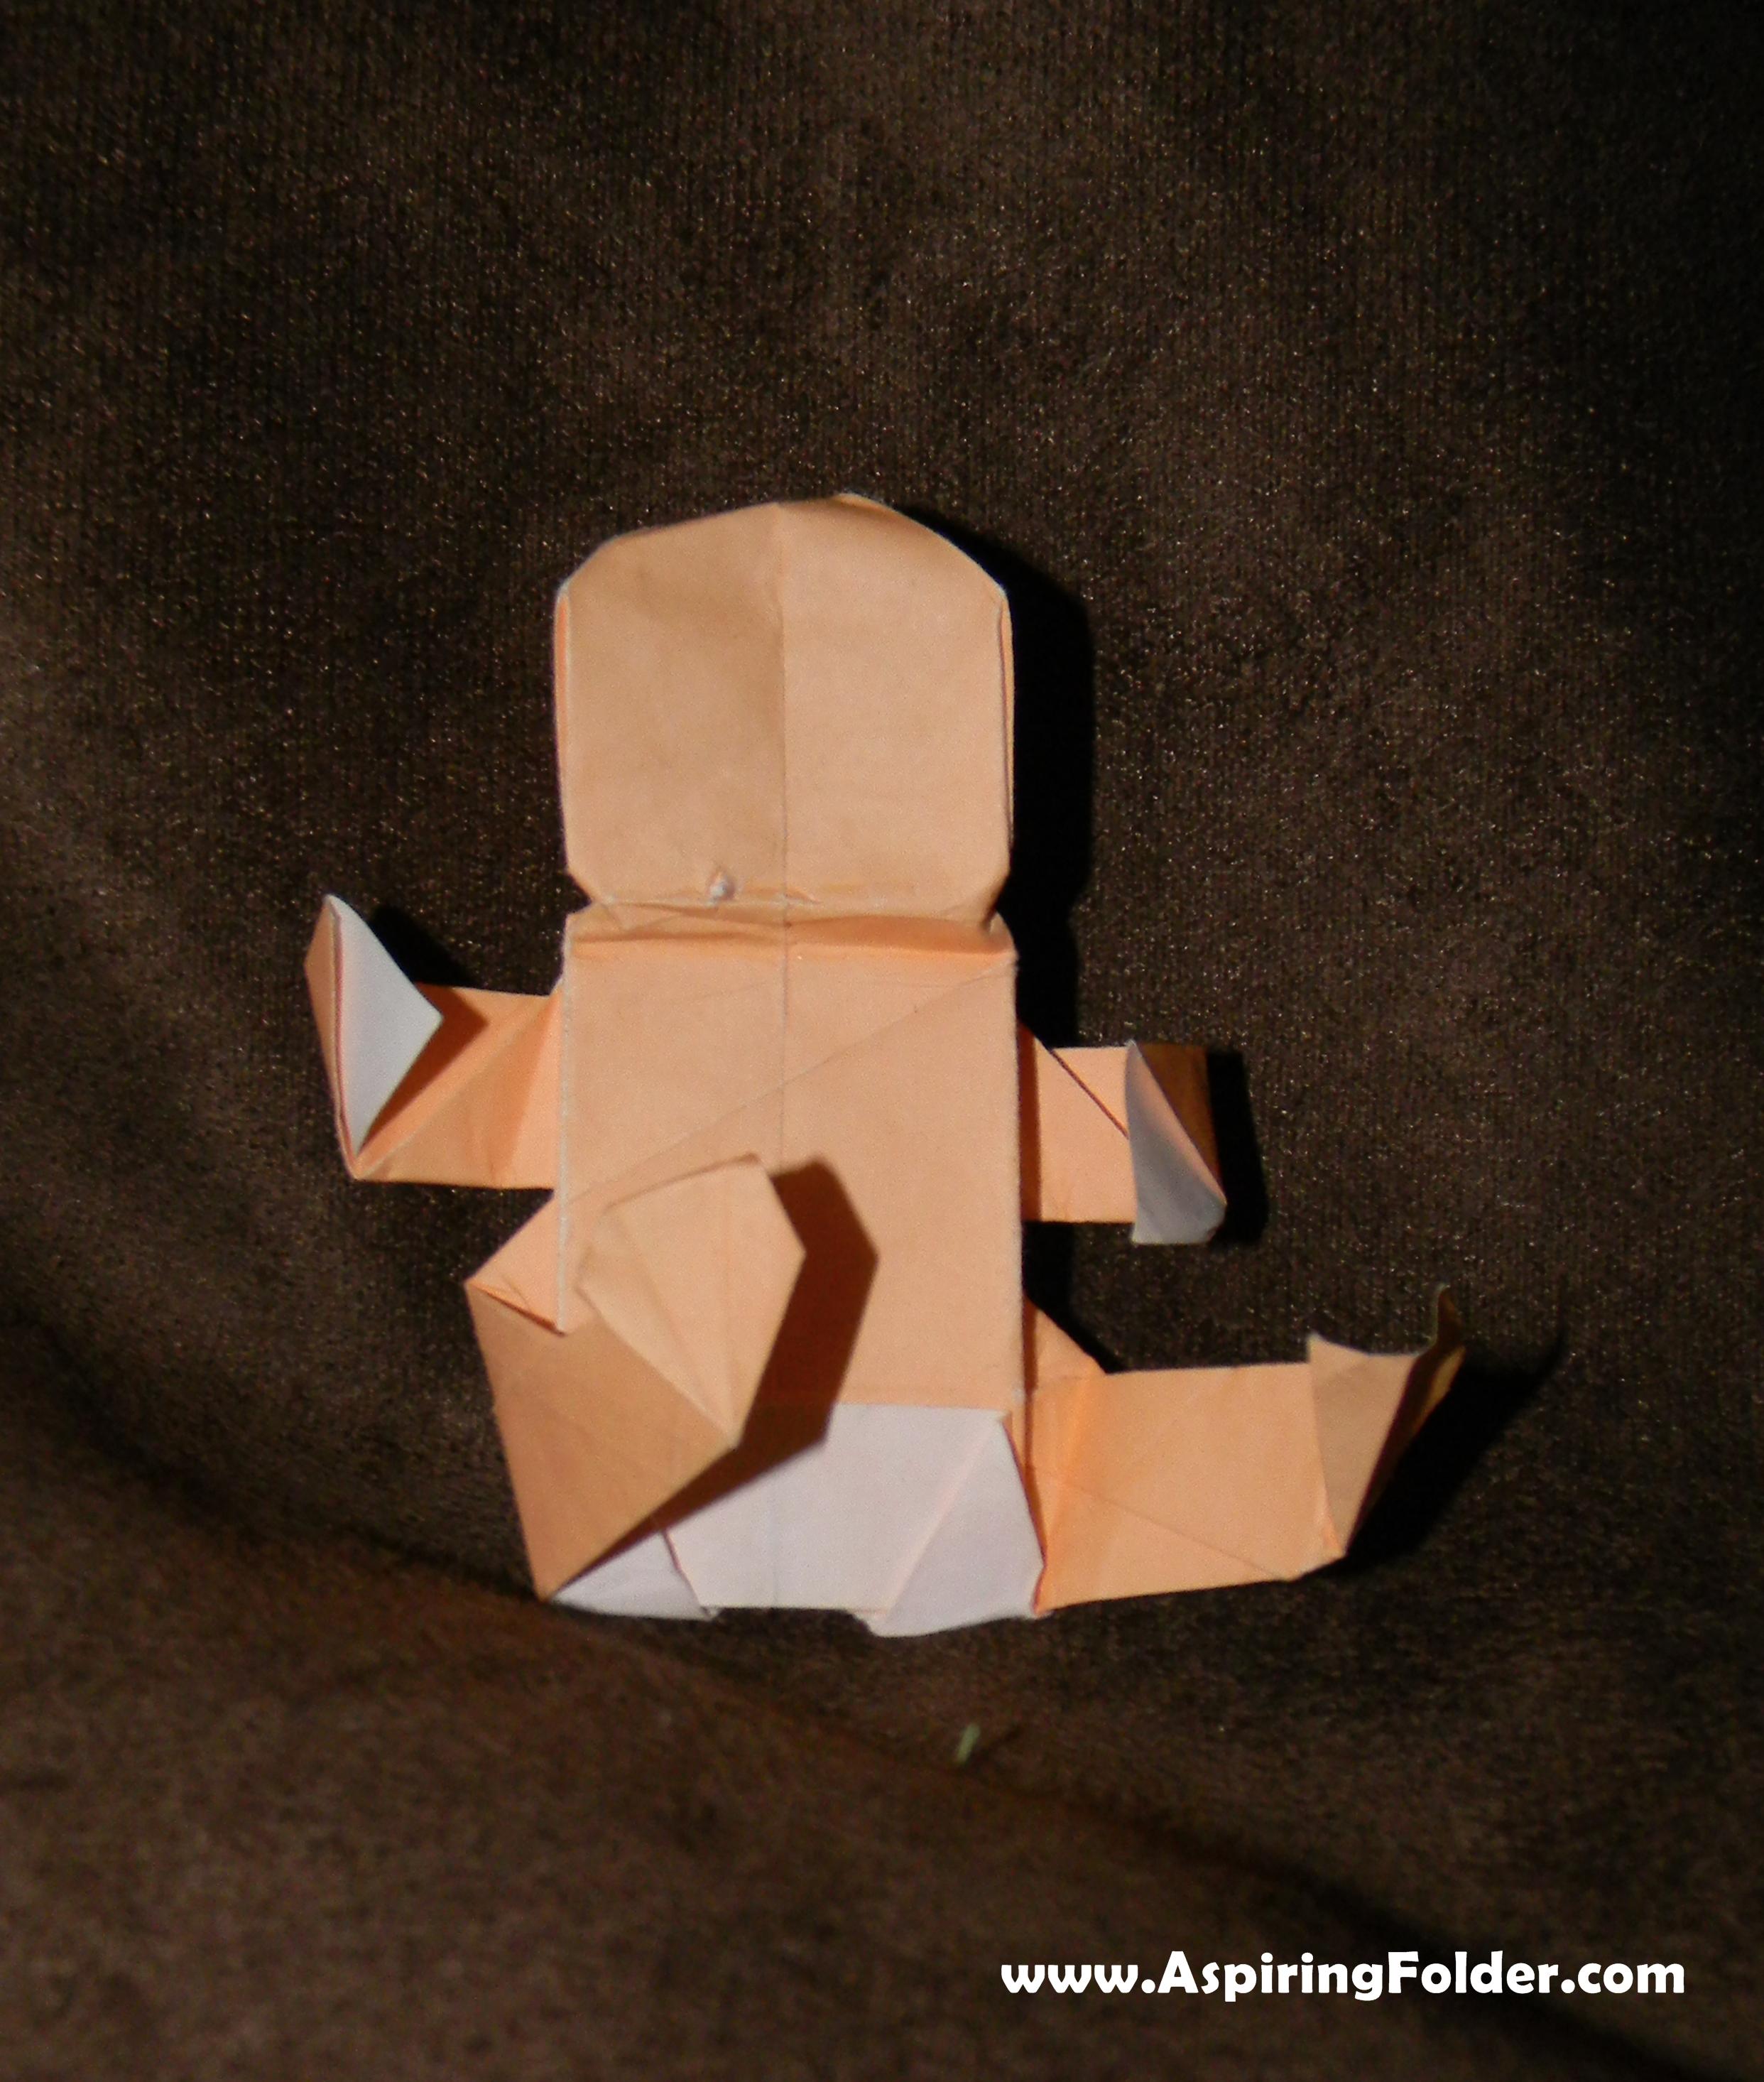 Origami Design Secrets 2nd Edition  PDF Free Download